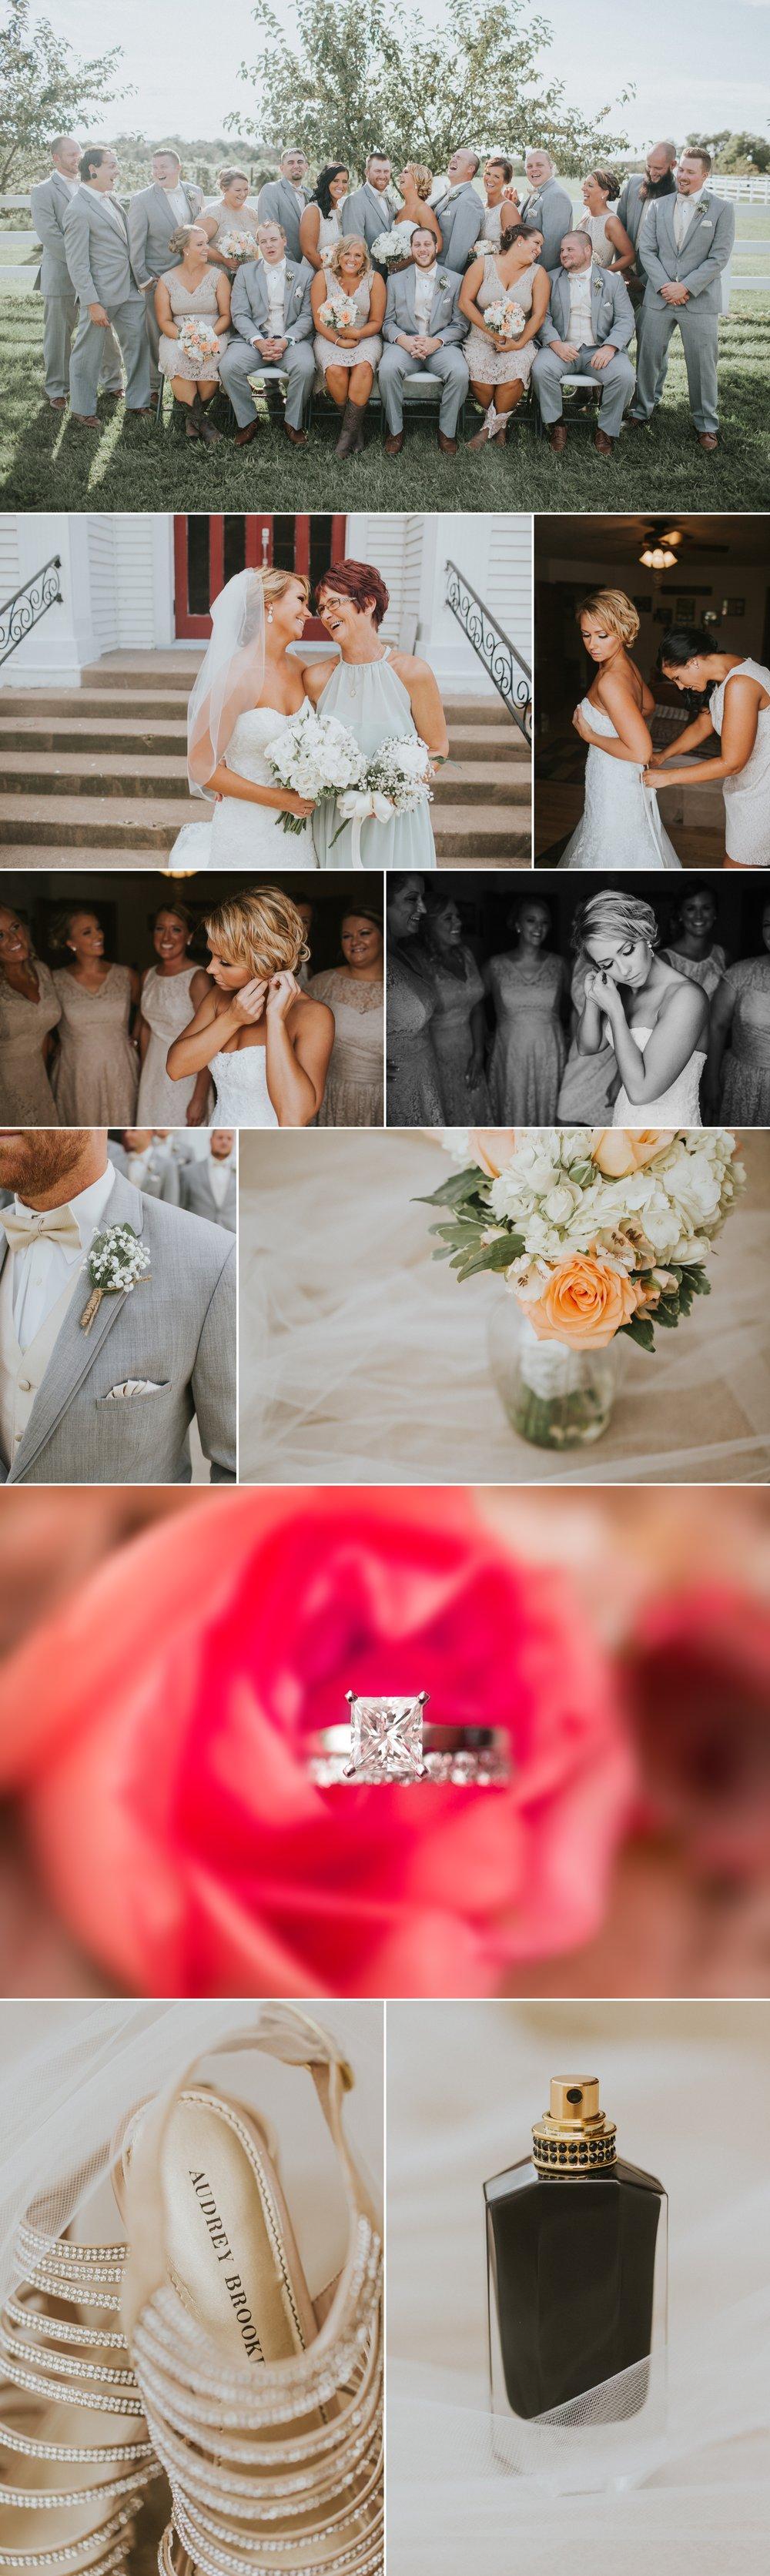 The Olson Wedding 2.jpg